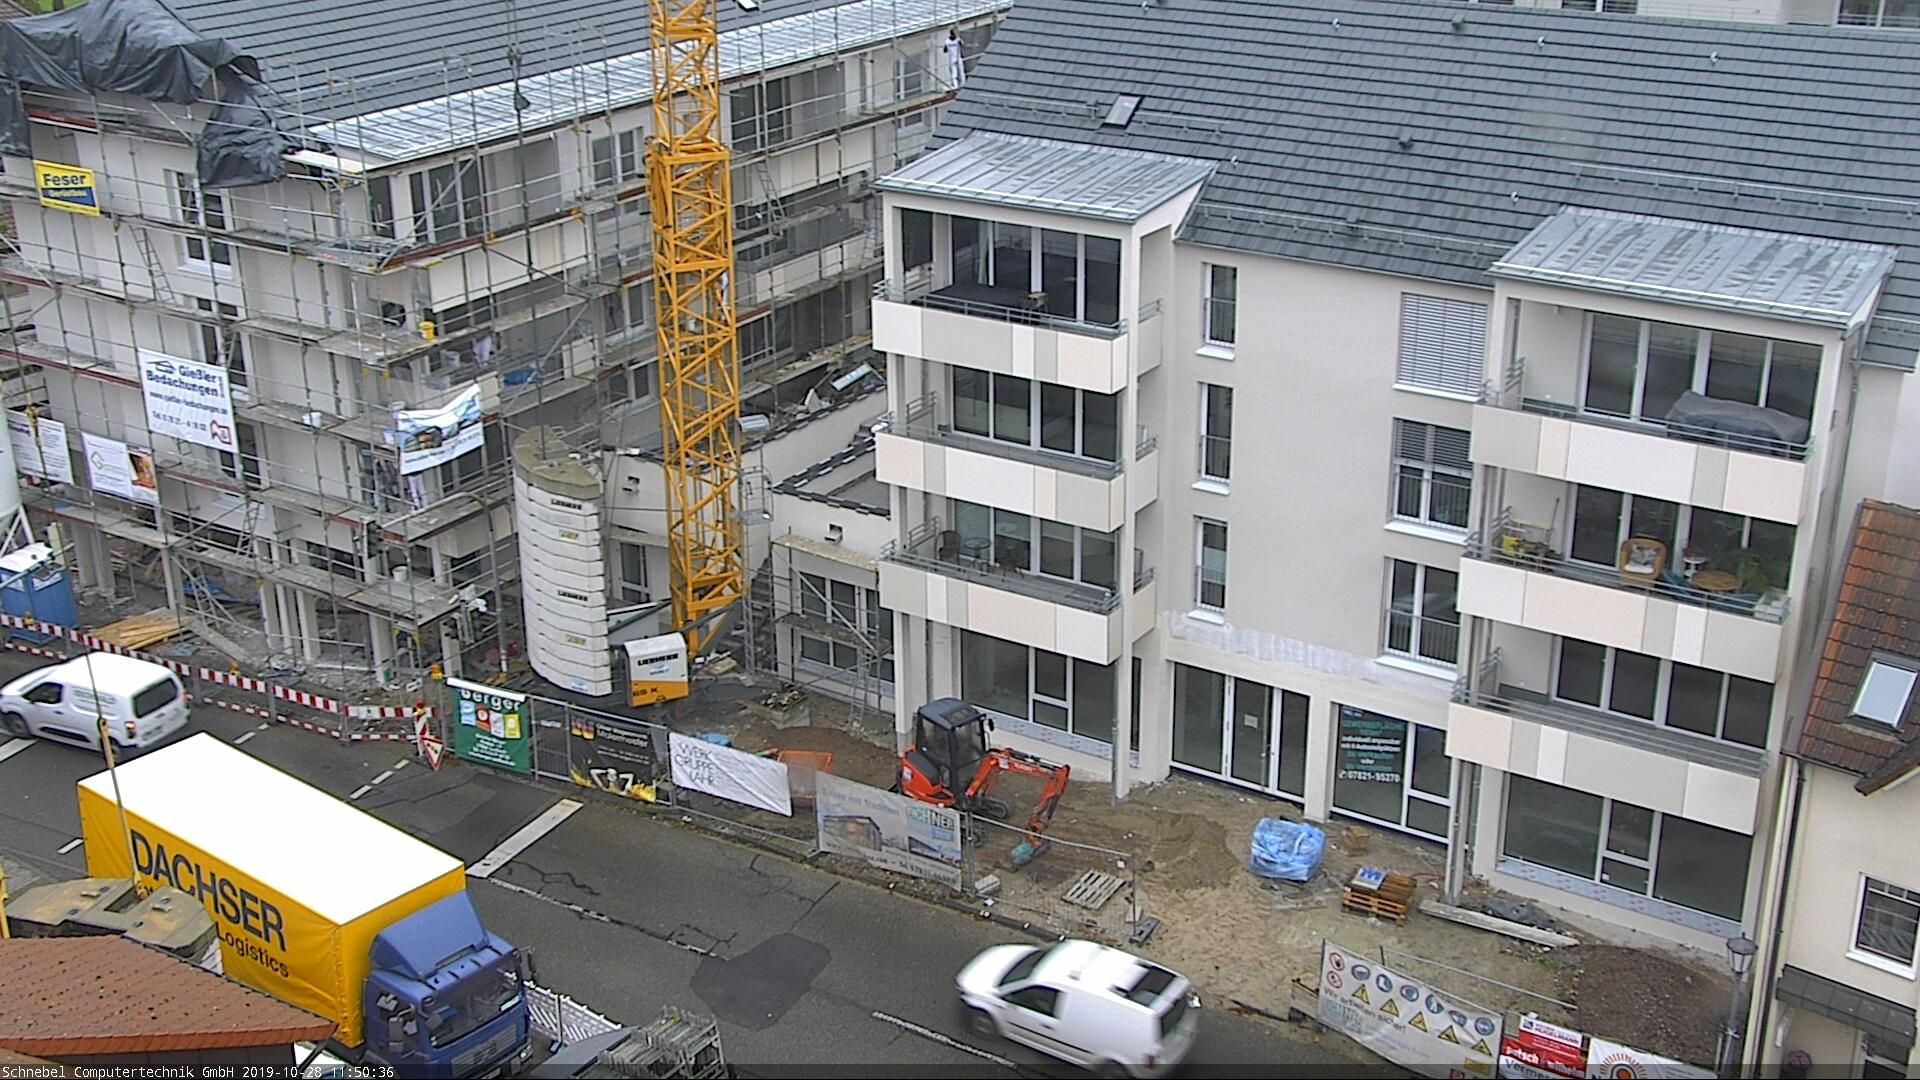 Seelbach, Hauptstraße